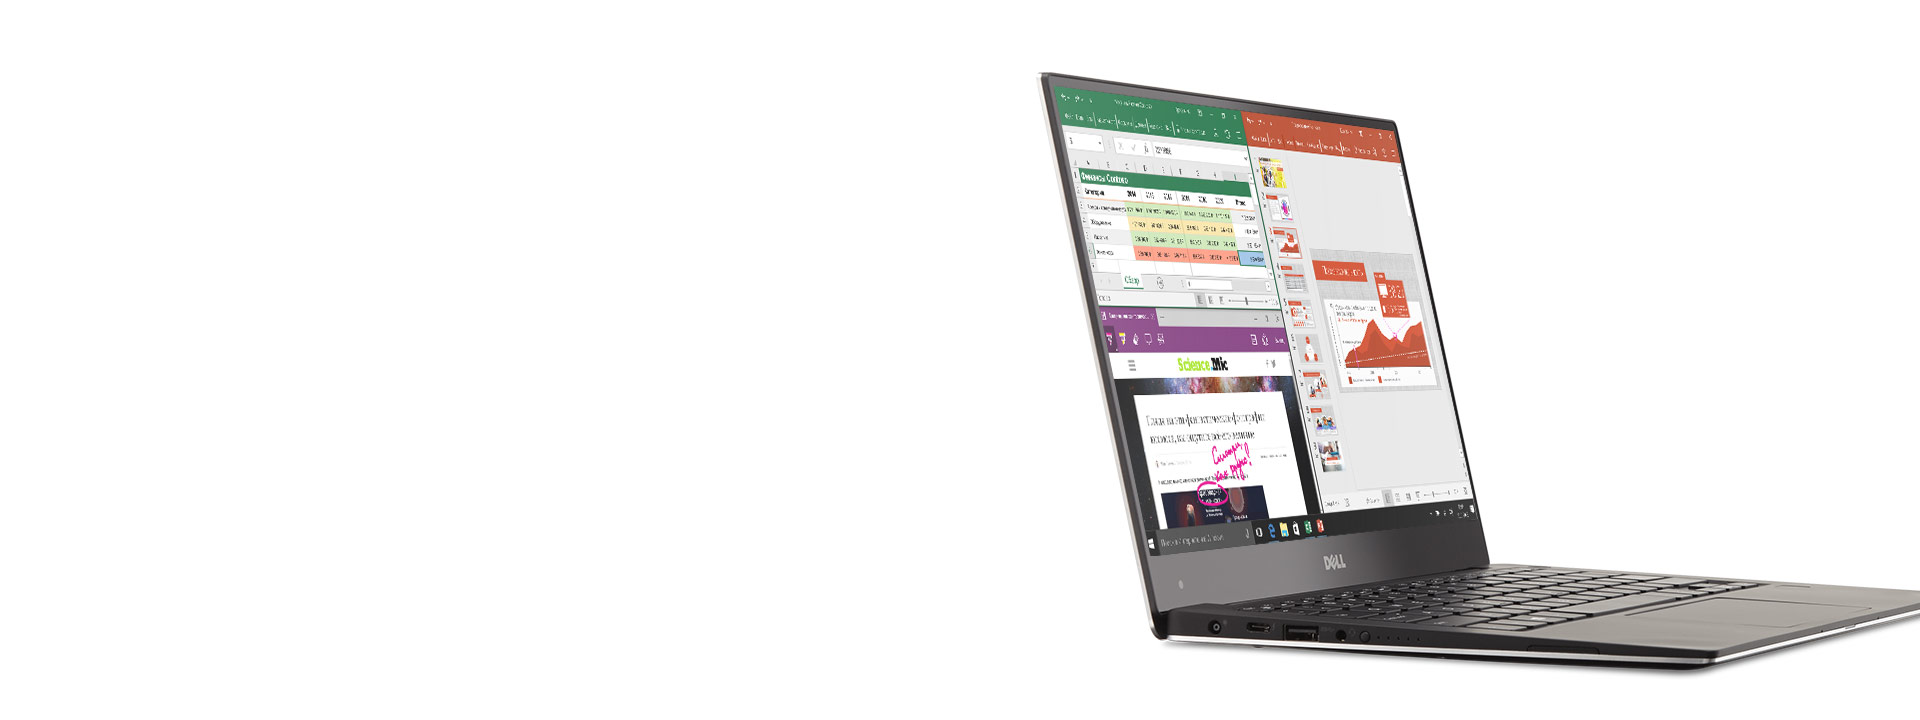 Surface Pro 4 с Office на экране